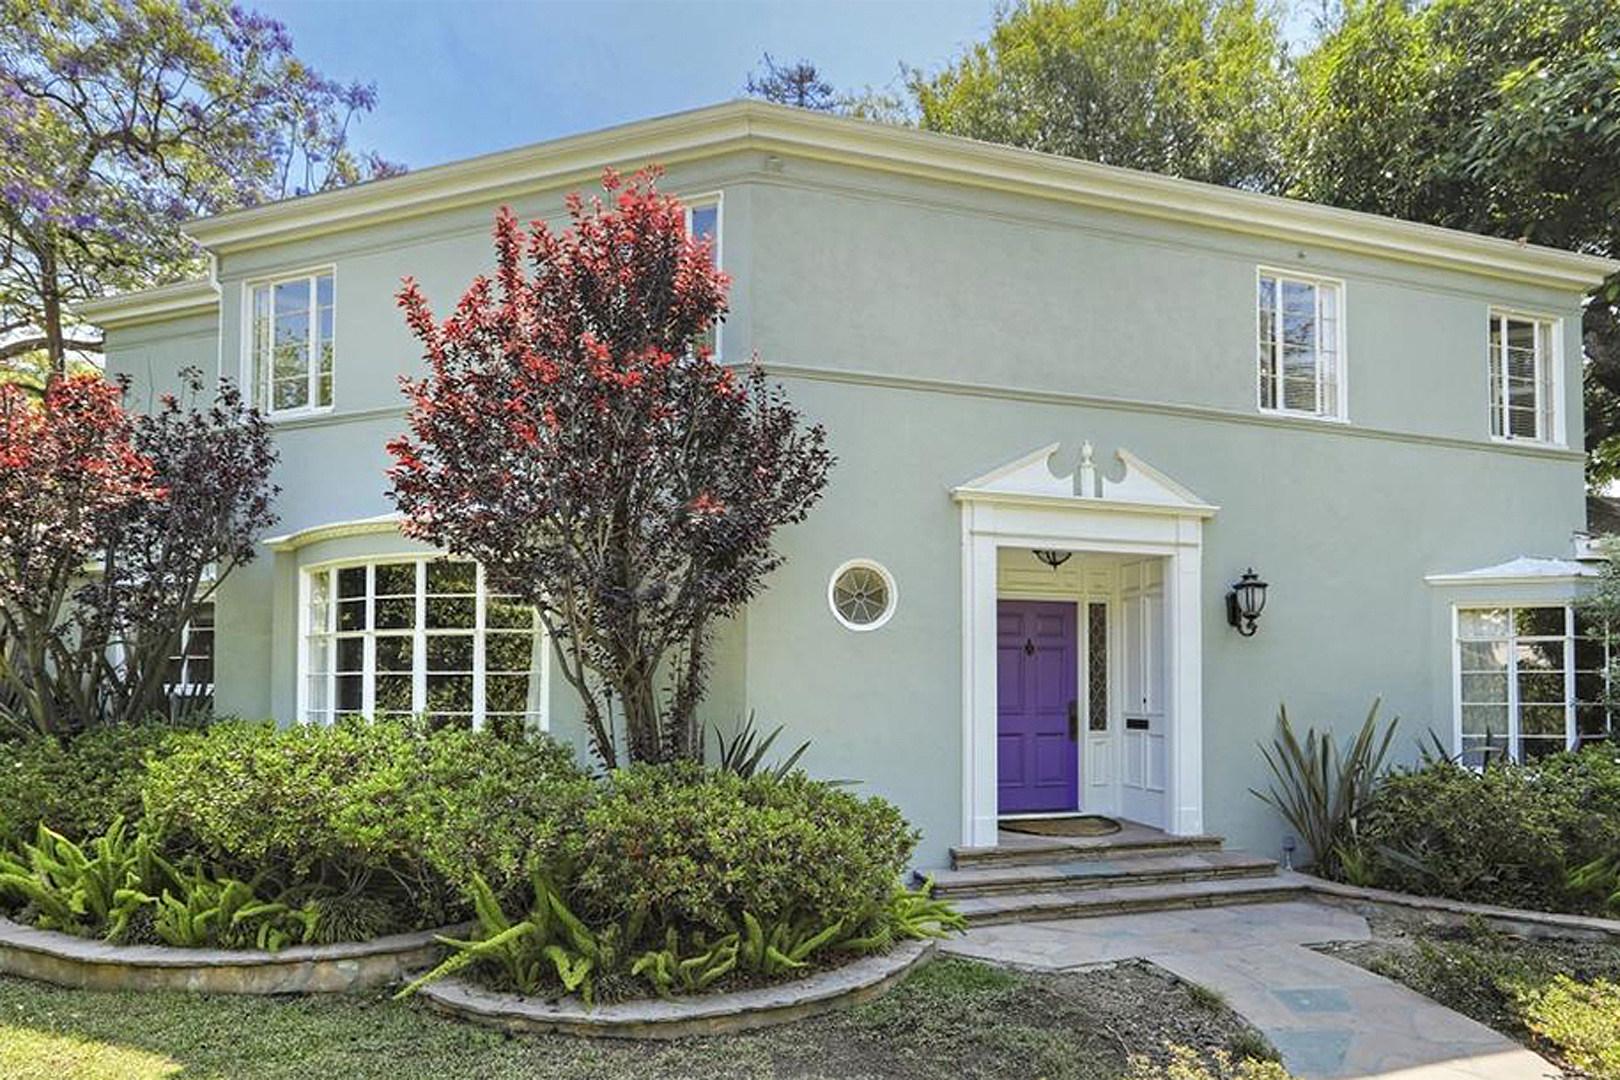 Flea Lists Los Feliz Area Estate for $2.997 Million